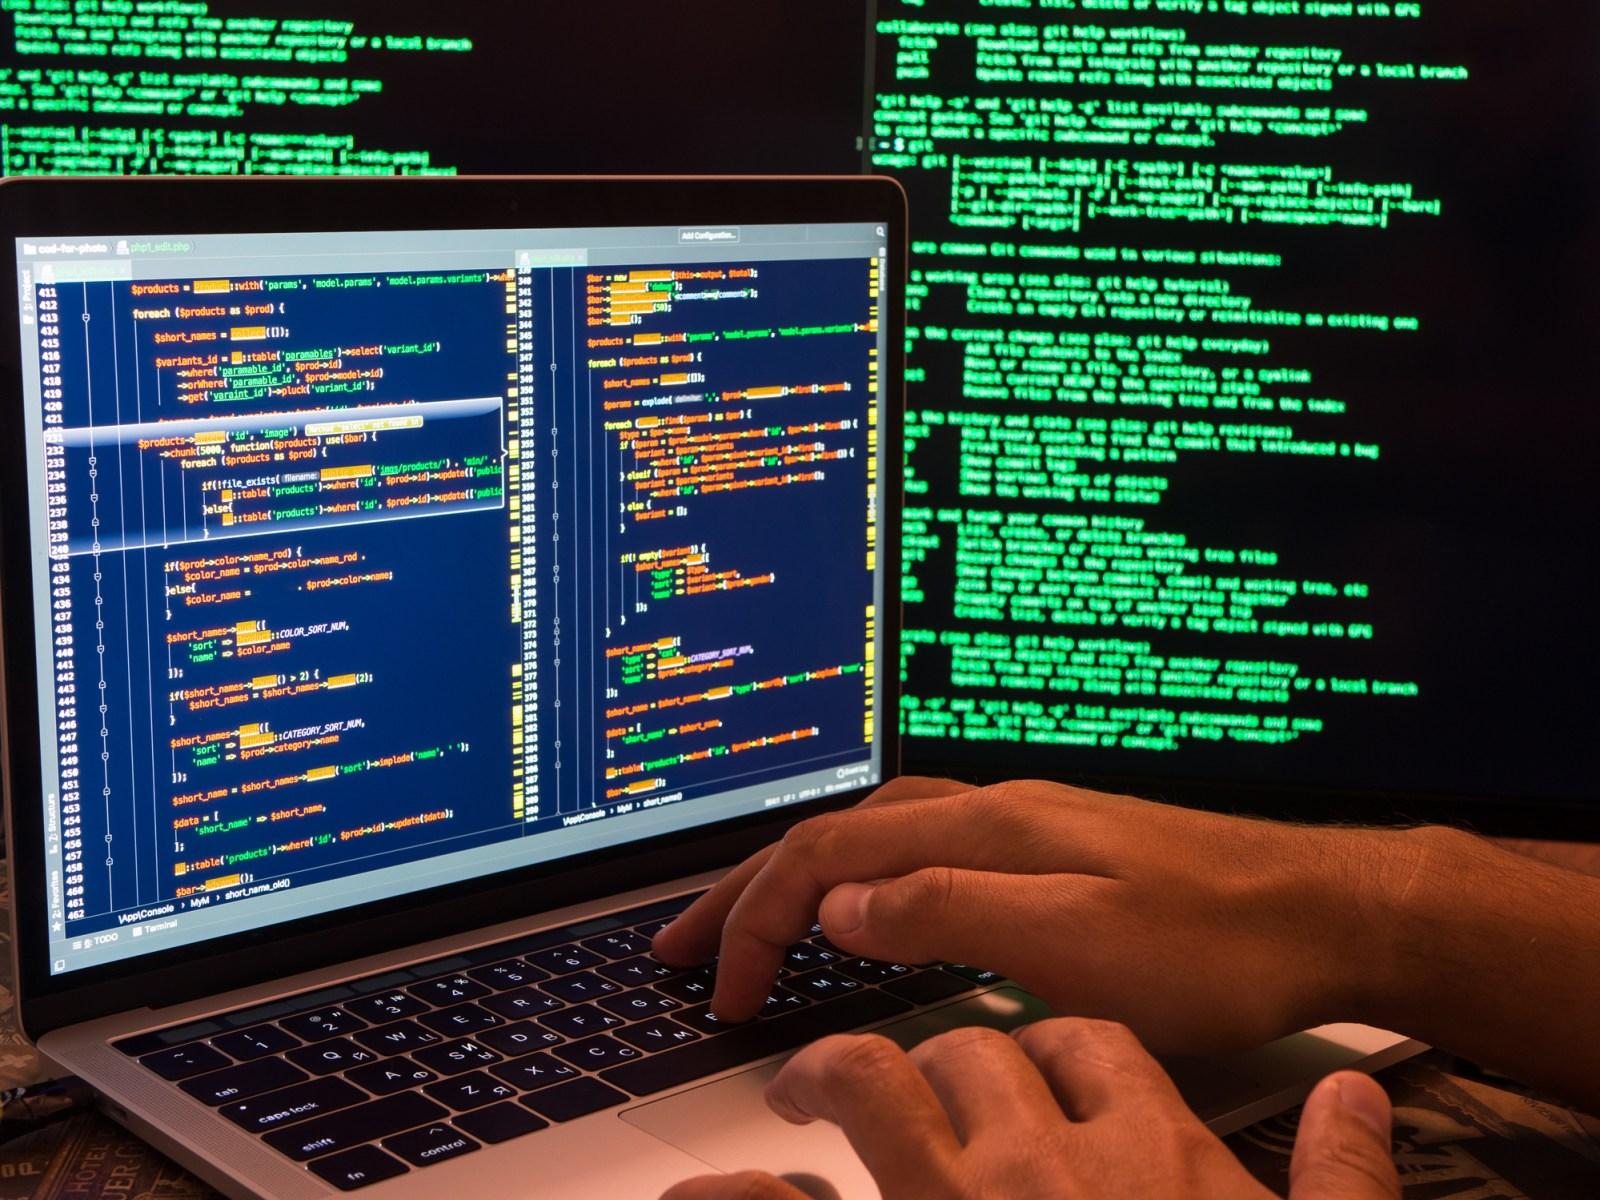 How the Melissa Virus Changed the Internet - InsideHook